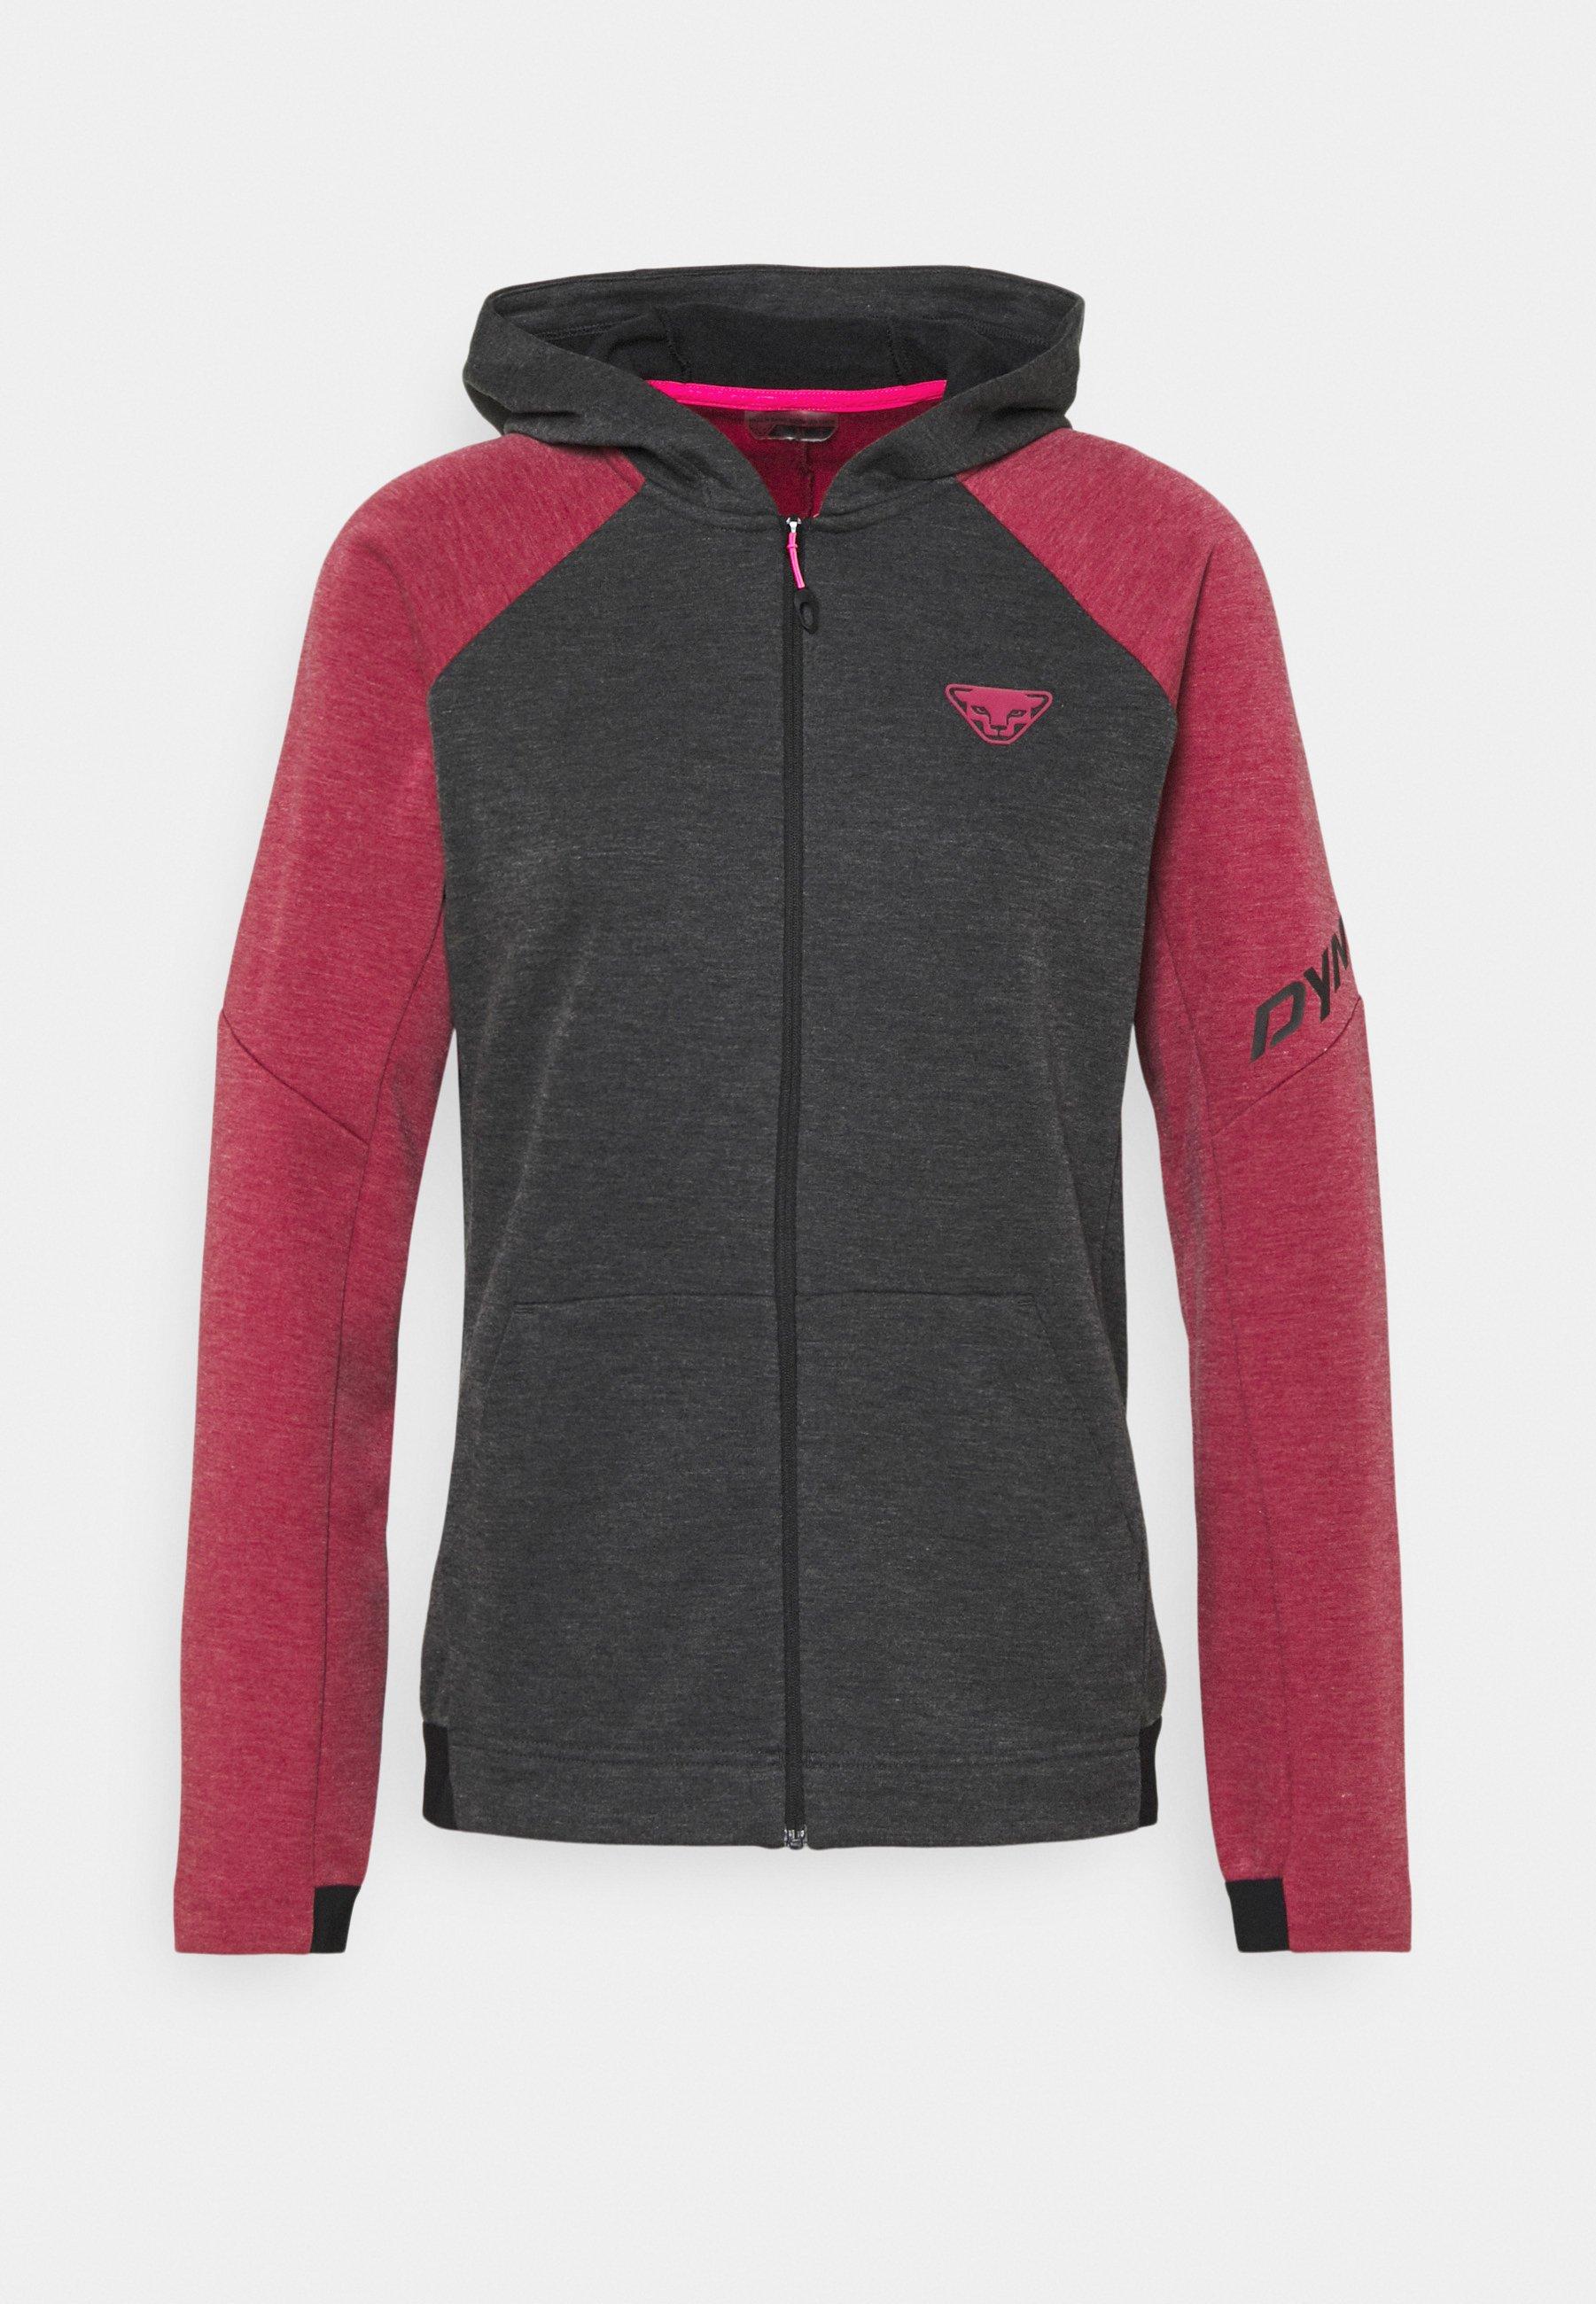 Femme ZIP HOODY  - Sweat à capuche zippé